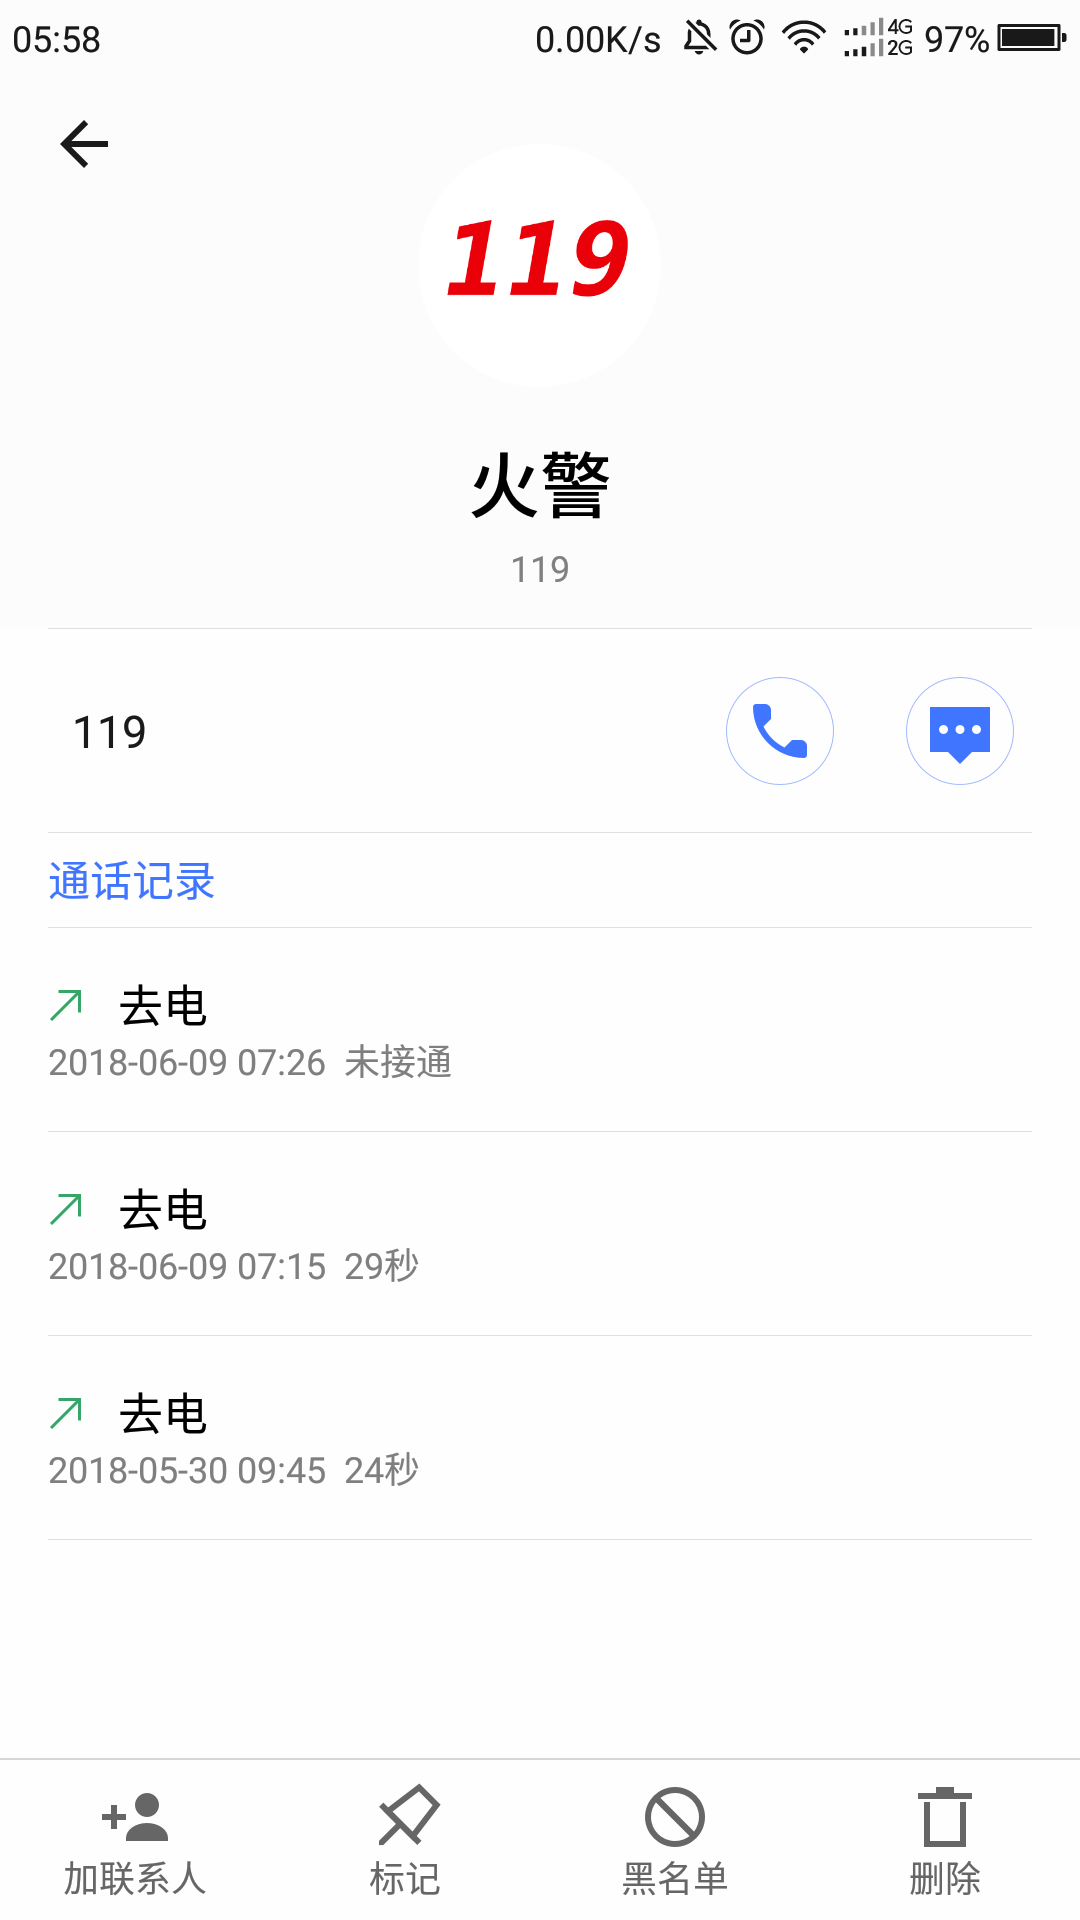 Screenshot_2018-06-16-05-58-58.png